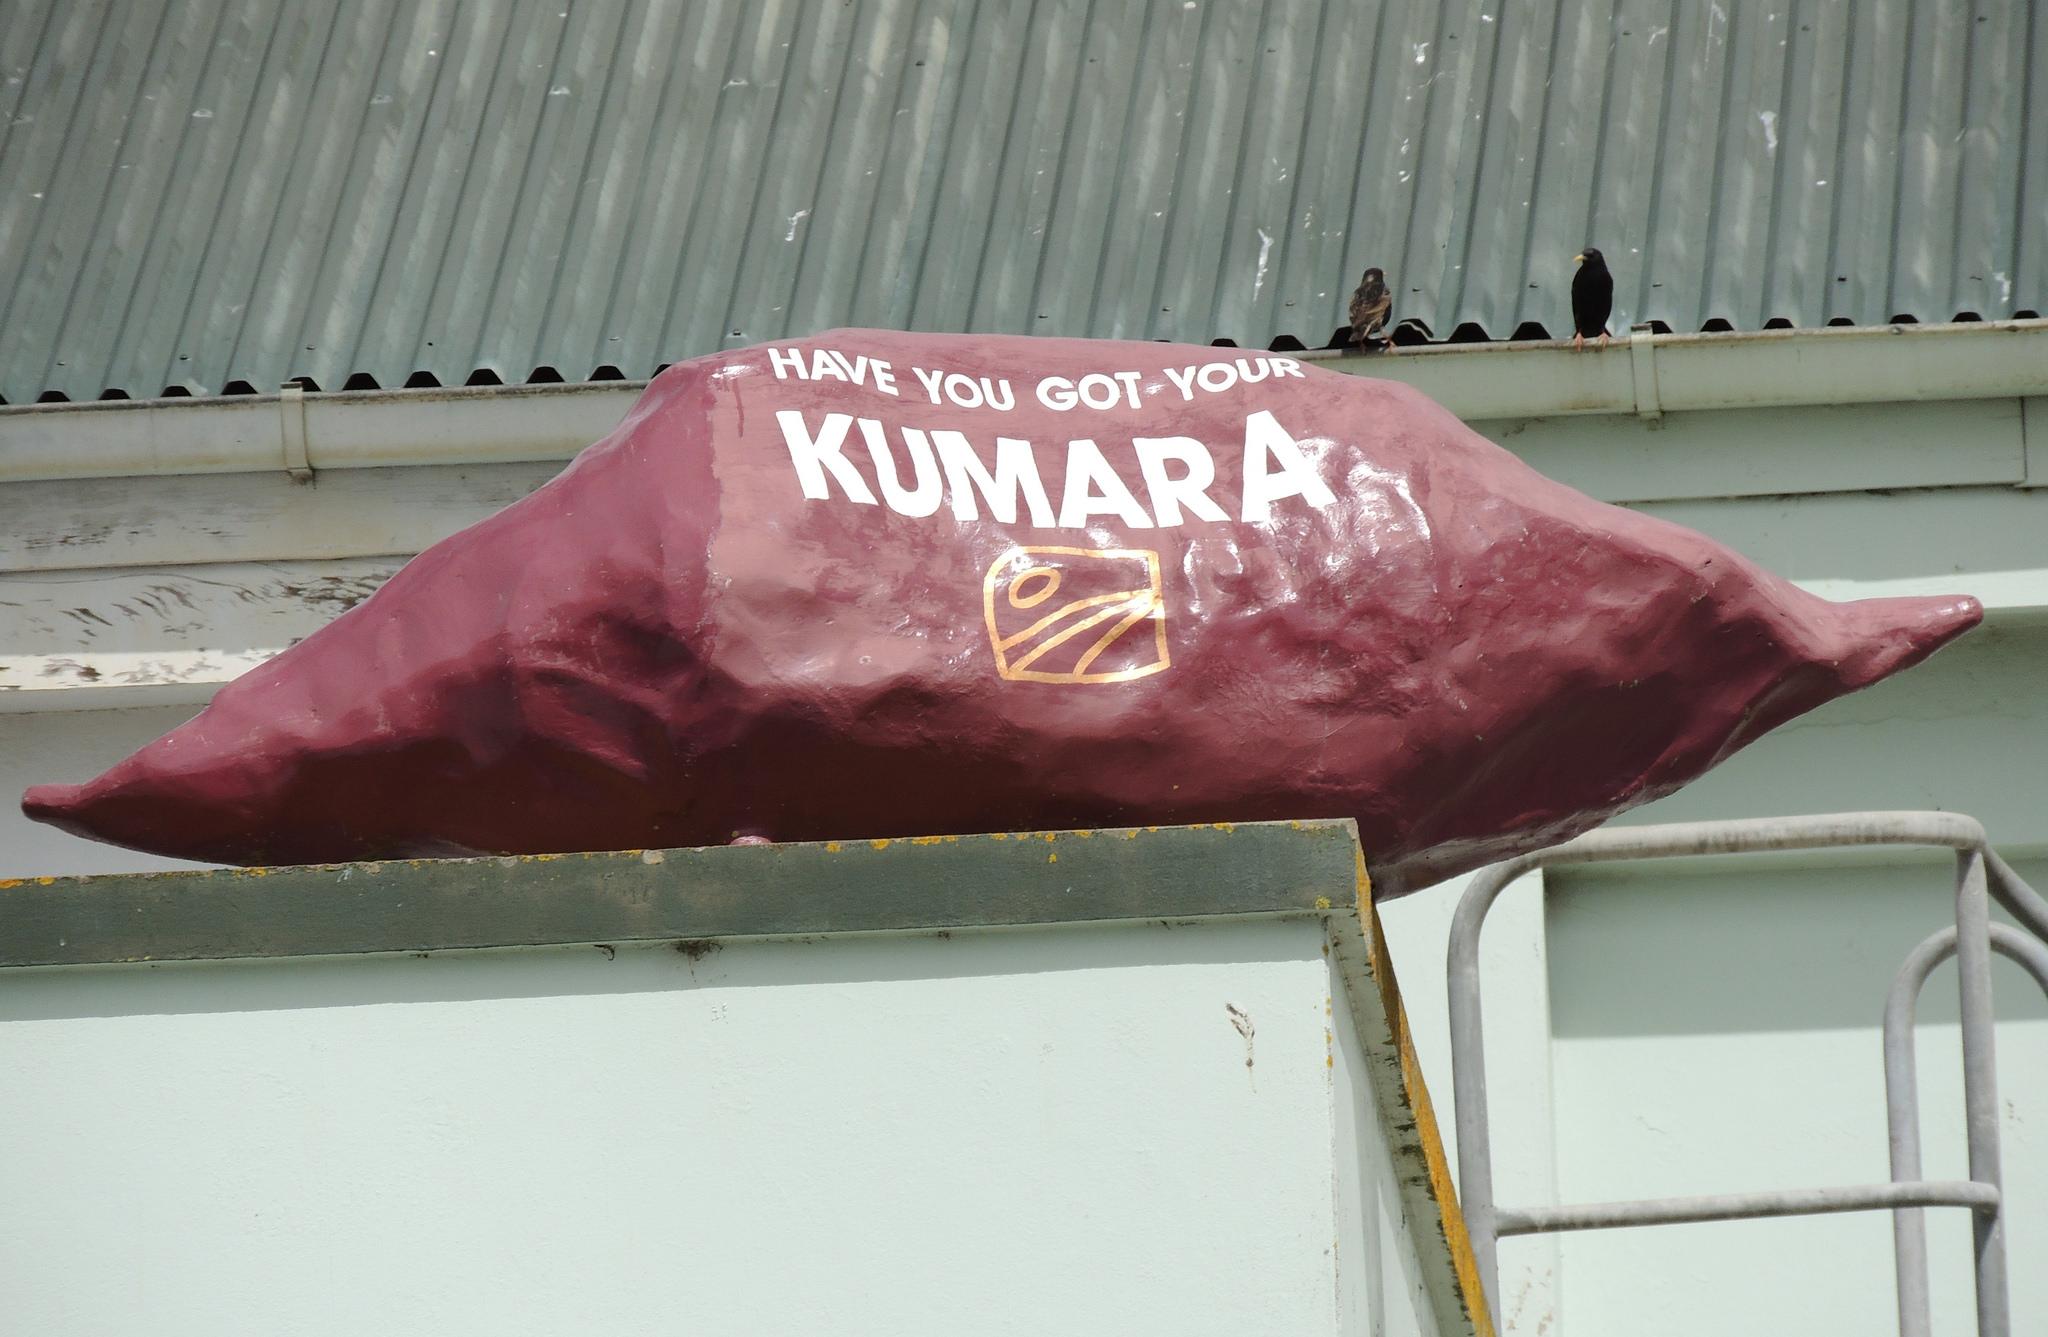 Kumara. Photo: Jennifer Whiting/Flickr CC